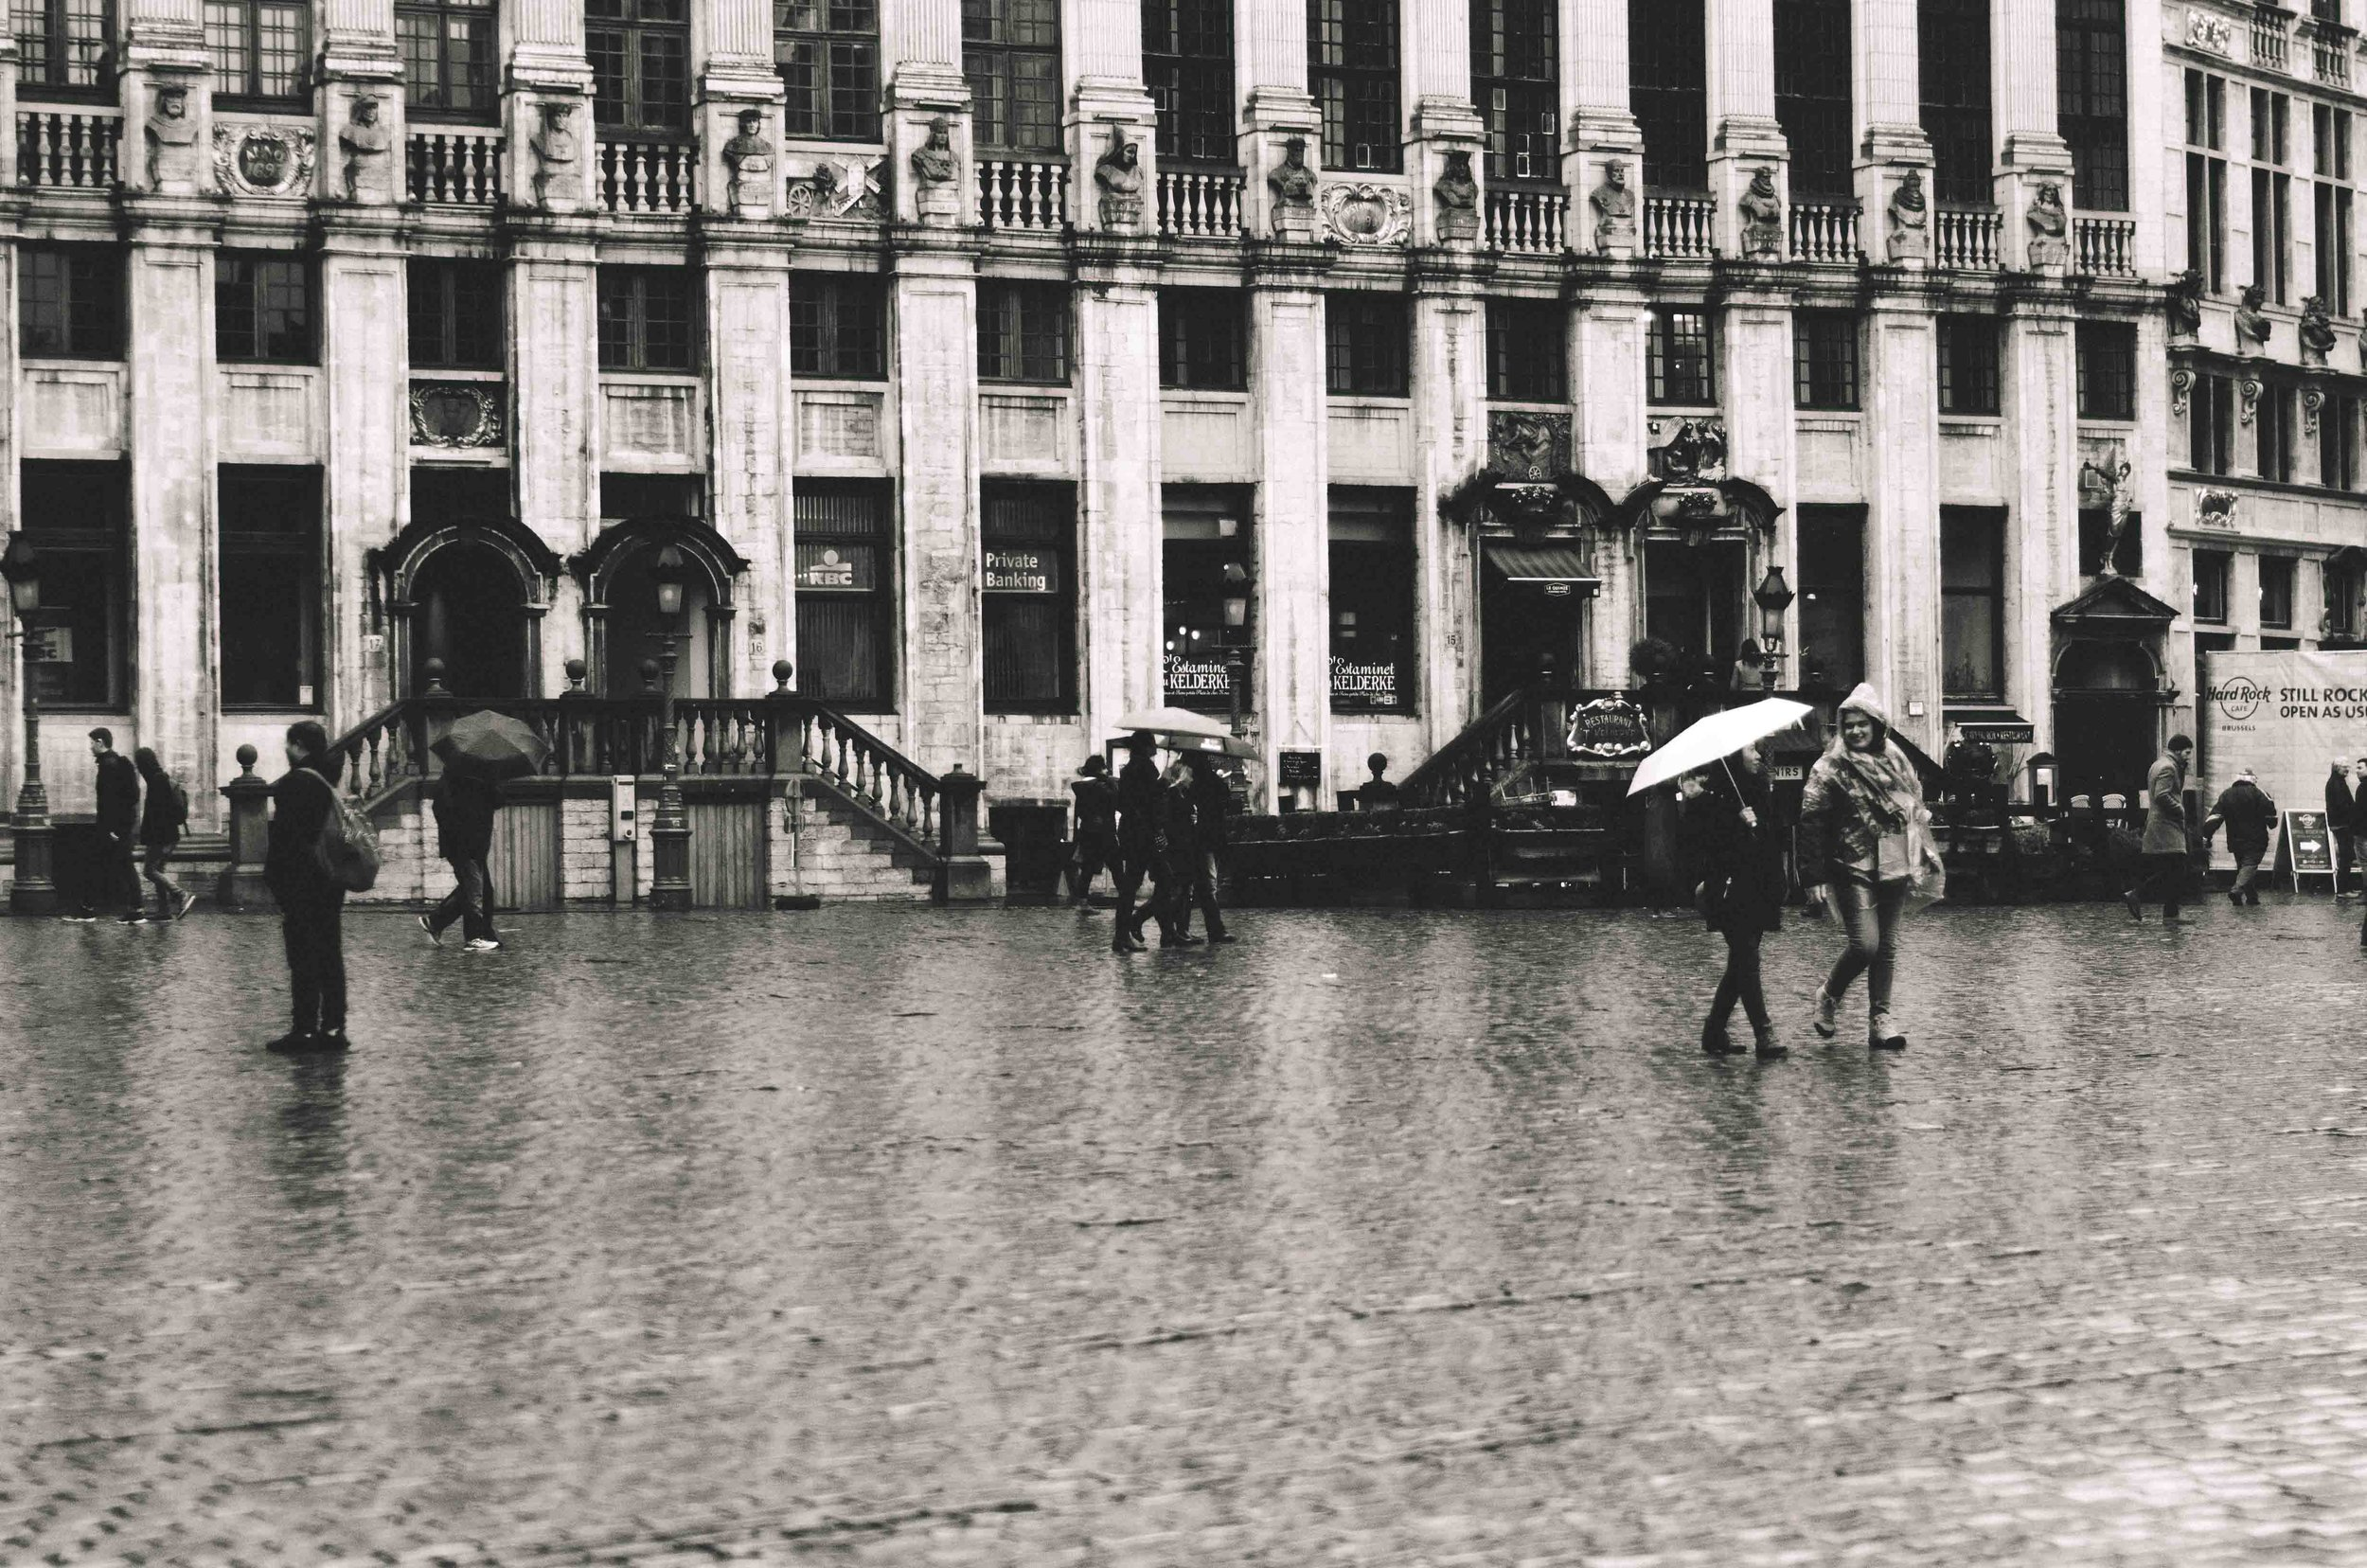 Rain in Grand Place